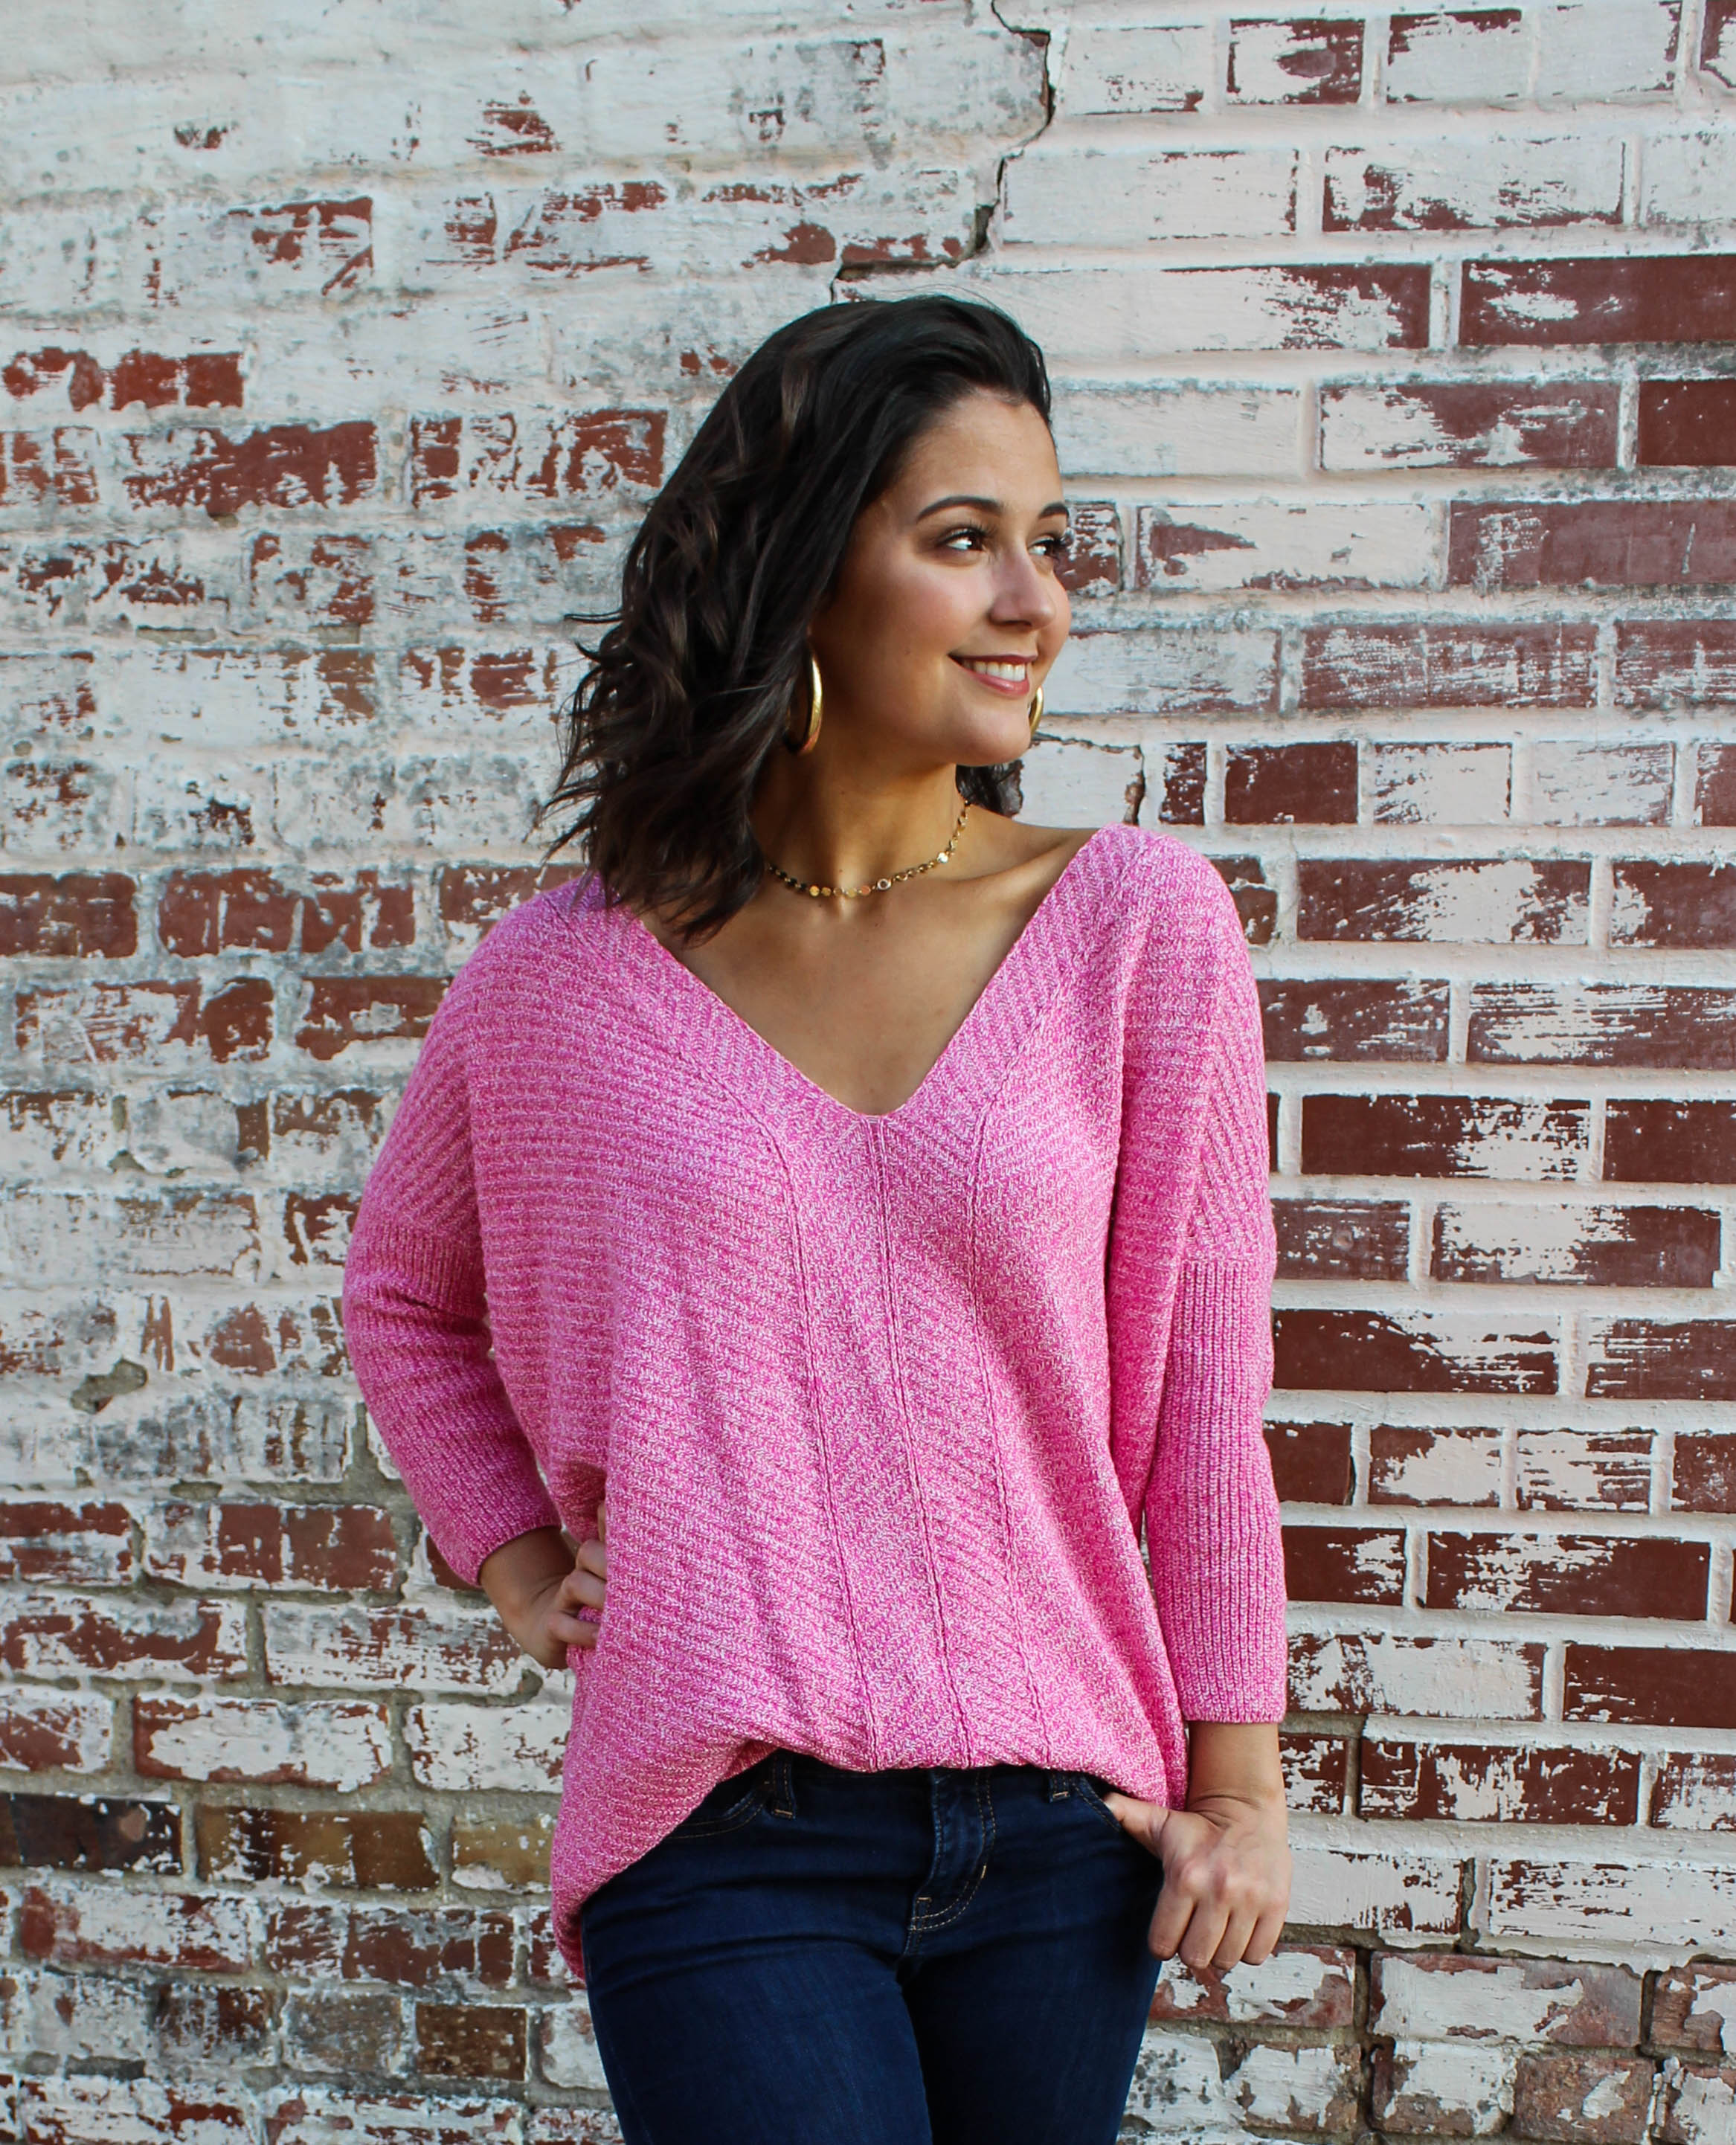 pinksweater4